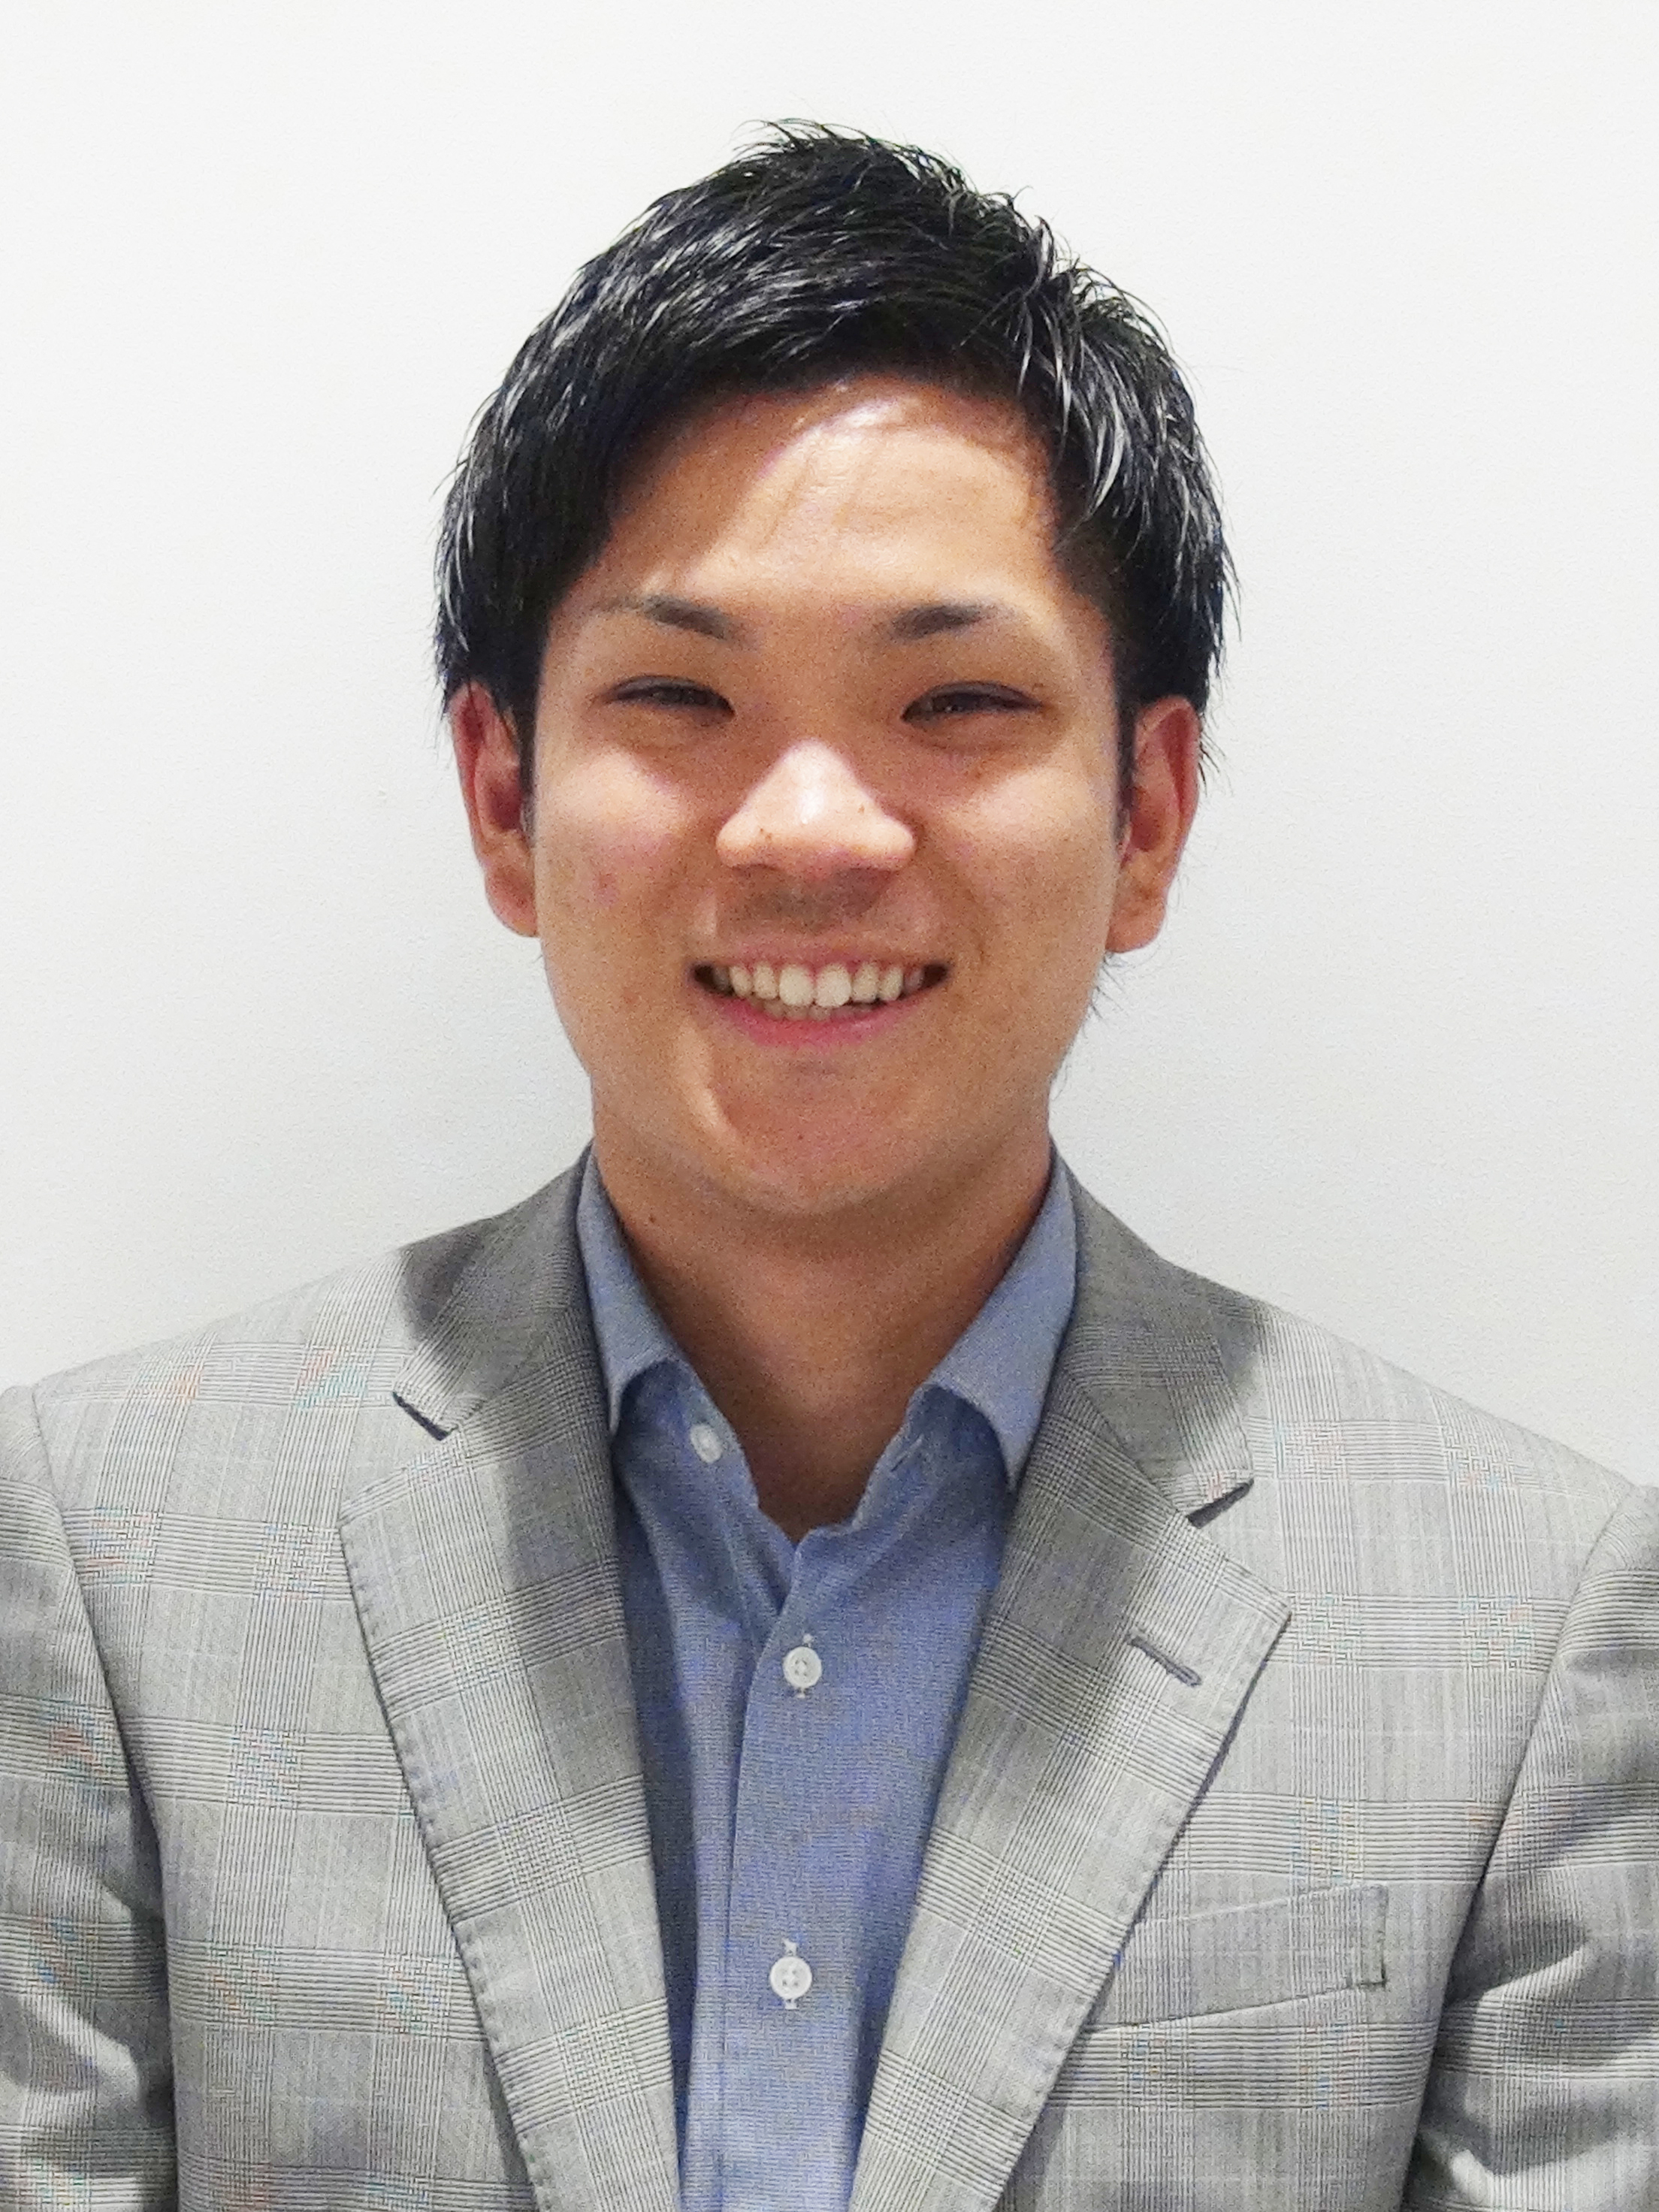 http://www.fullspeed.co.jp/press/wp-content/uploads/2017/06/mishima.jpg